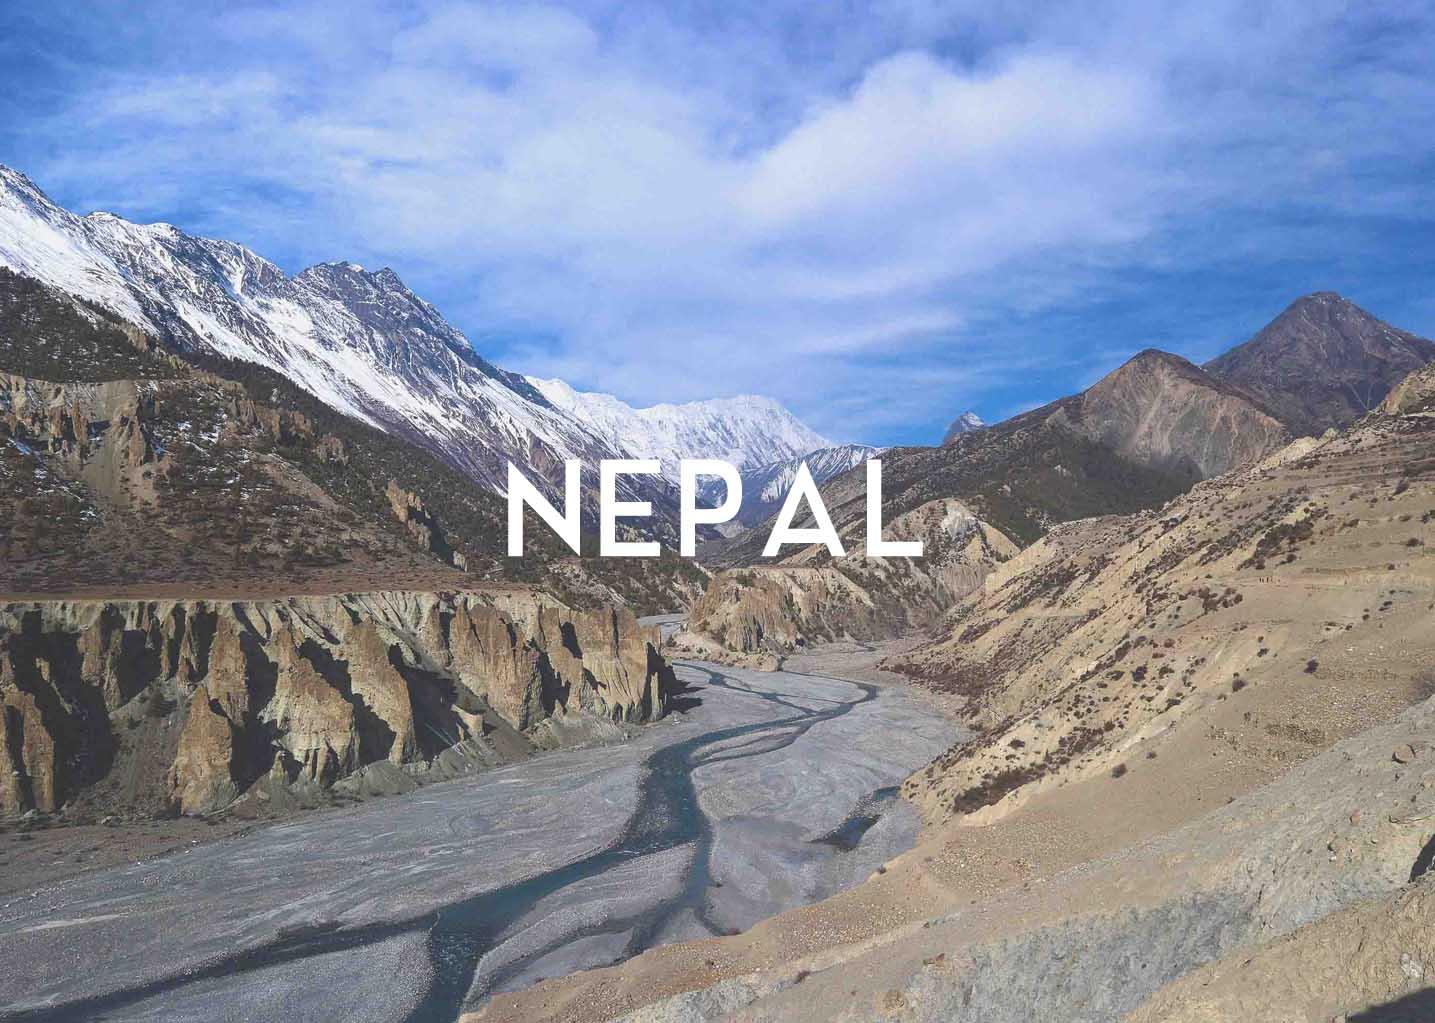 Nepal posts